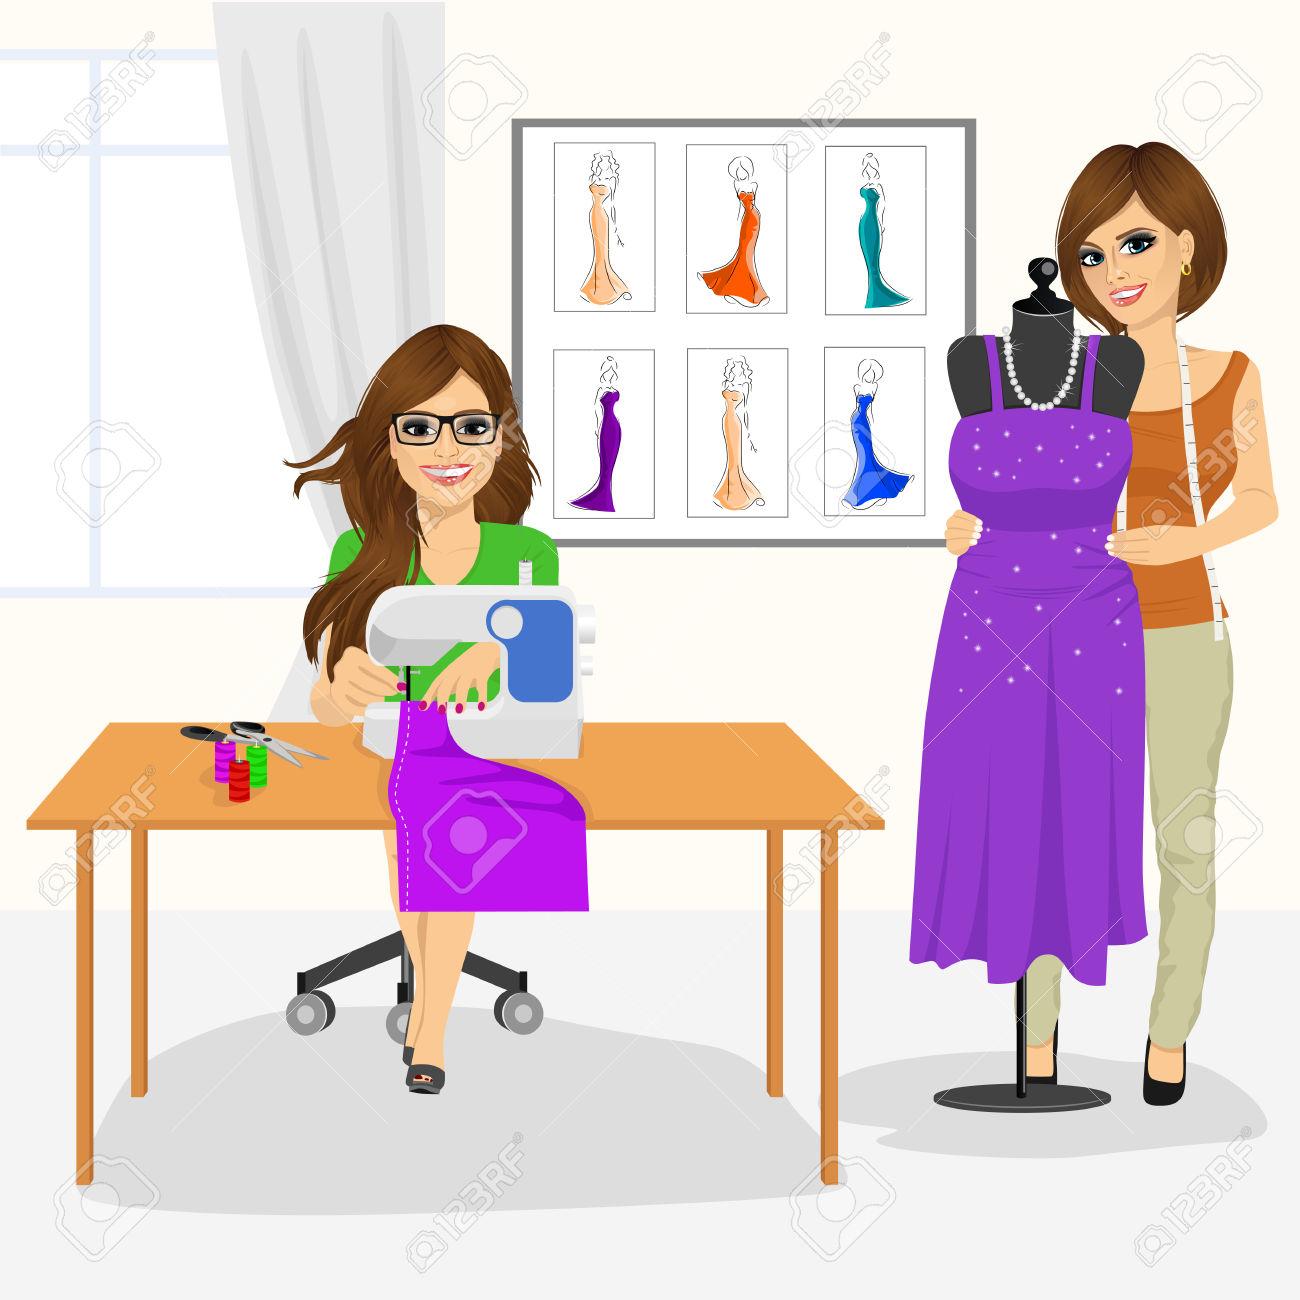 Dressmaker Woman Using Sewing Machine And Fashion Designer Draping.